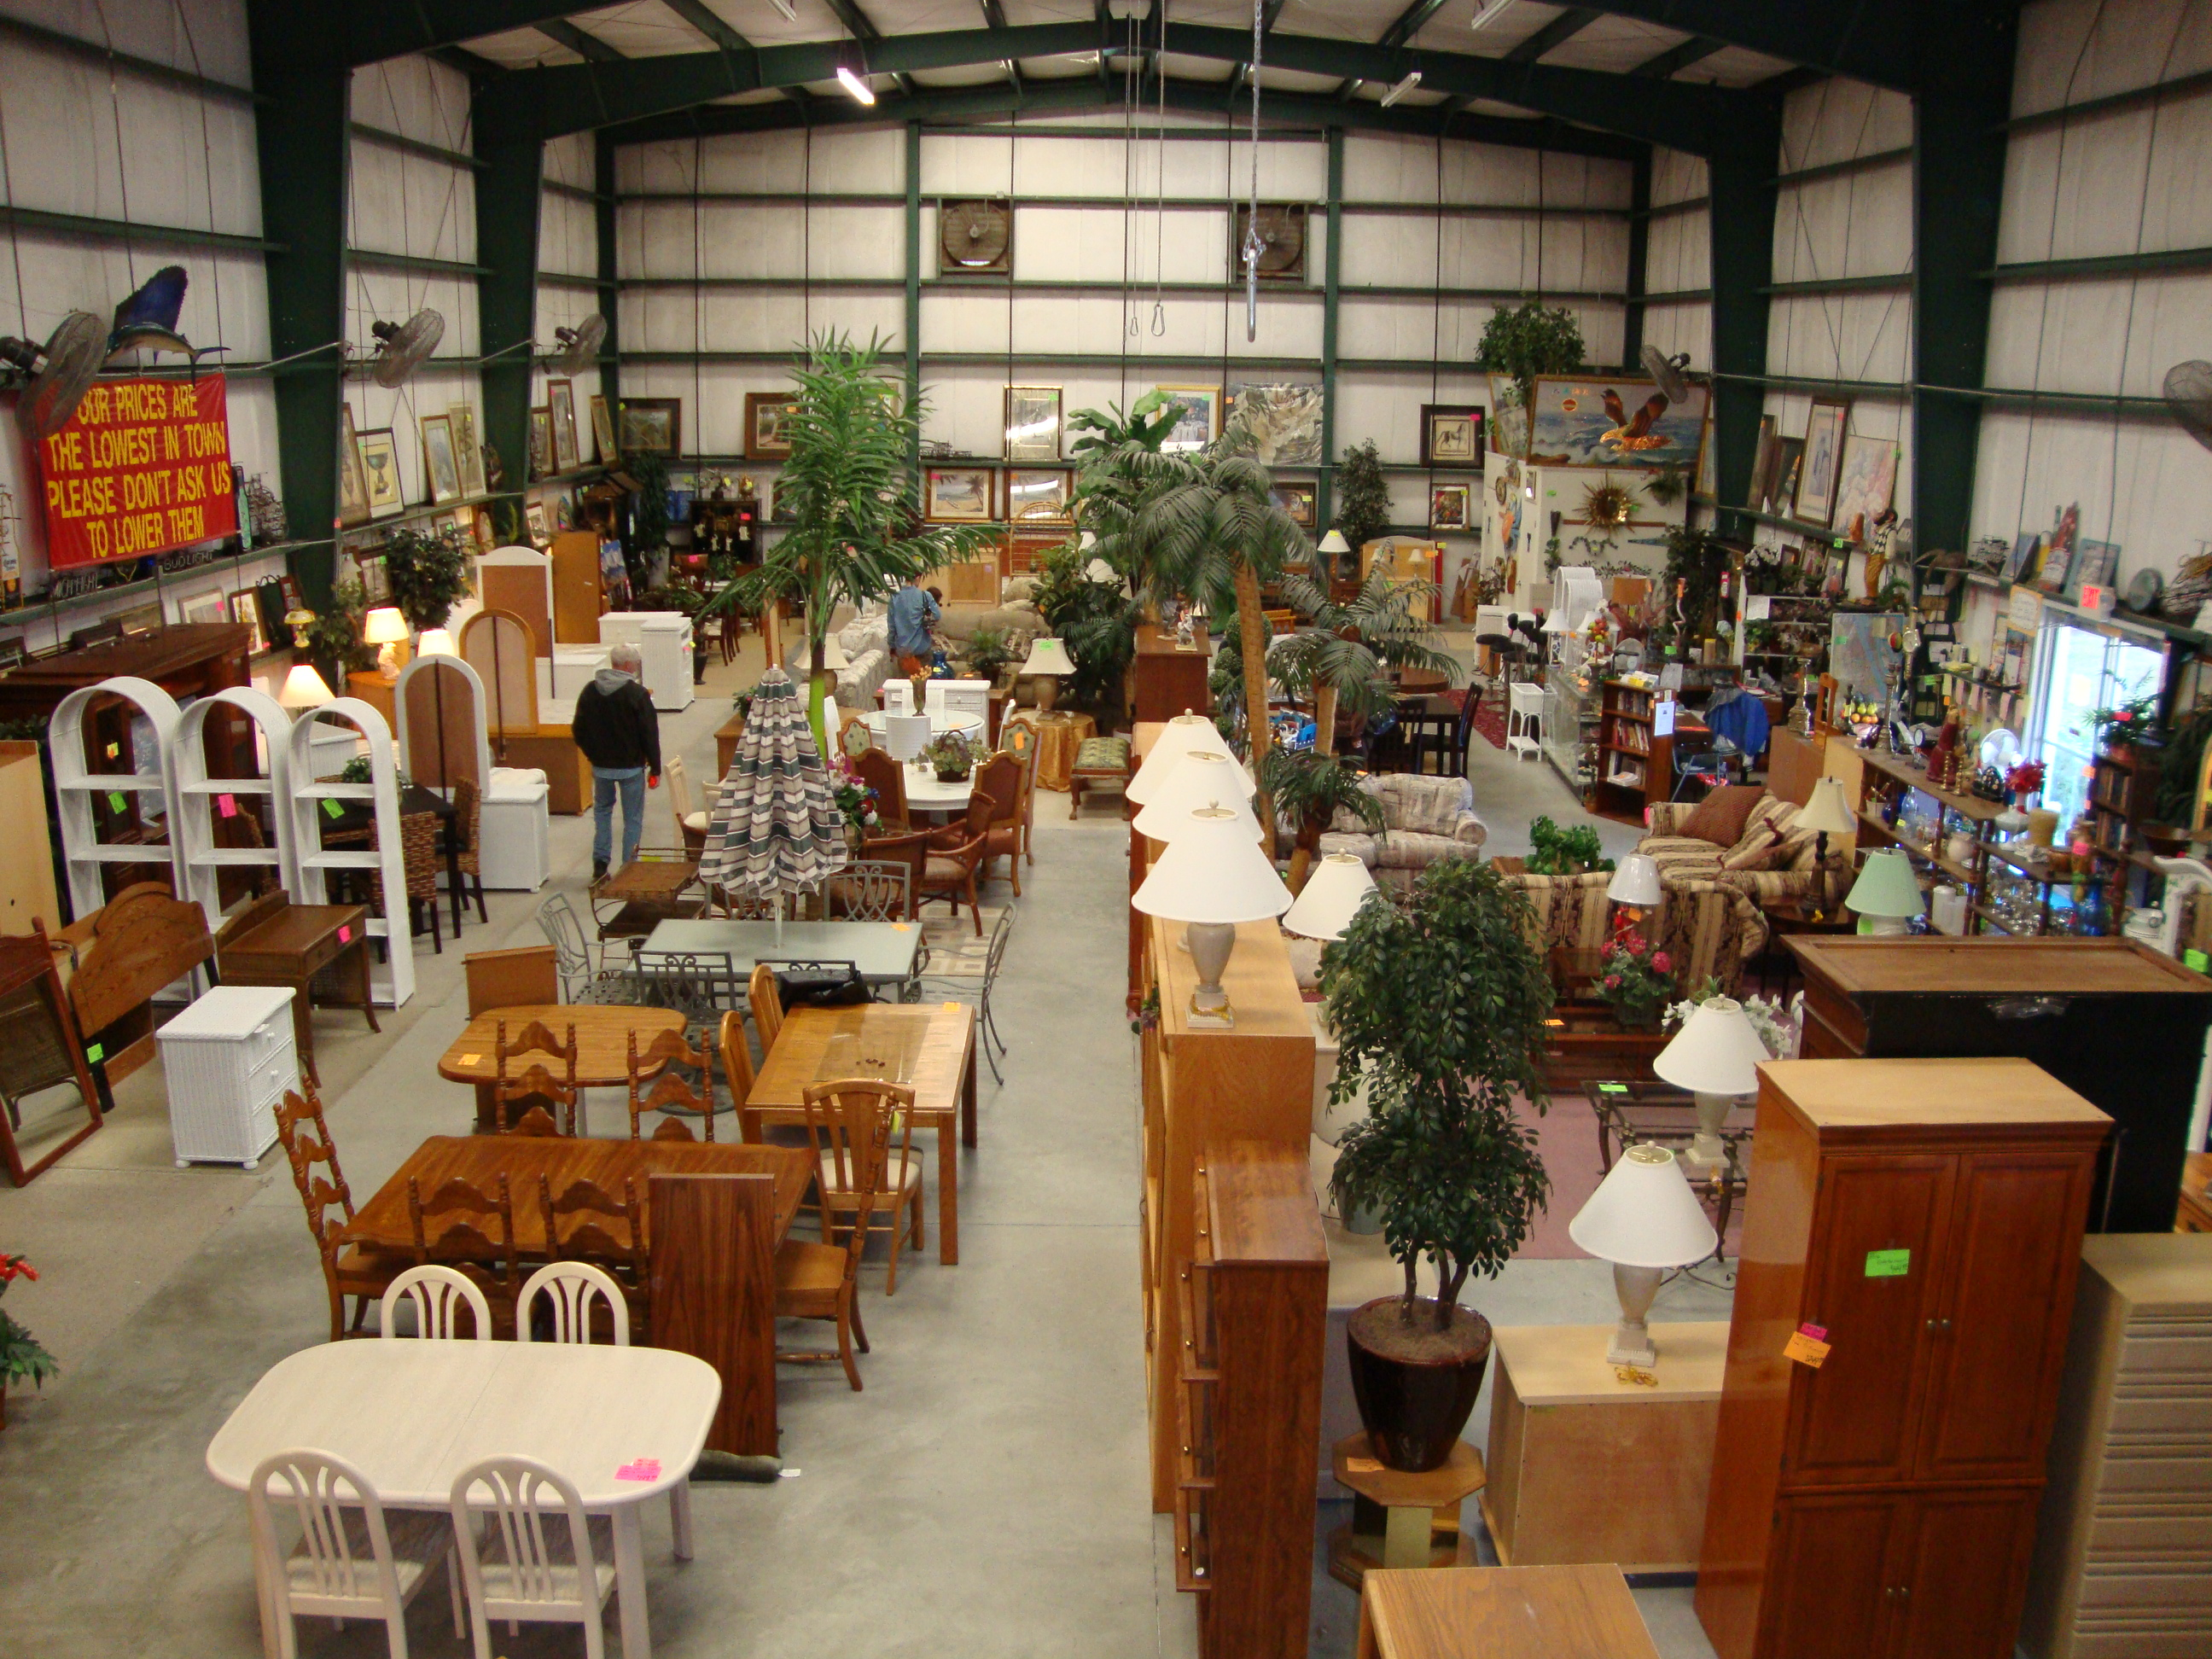 Charmant Westside Used Furniture Warehouse 2140 Meadowlane Ave, Melbourne, FL 32904    YP.com